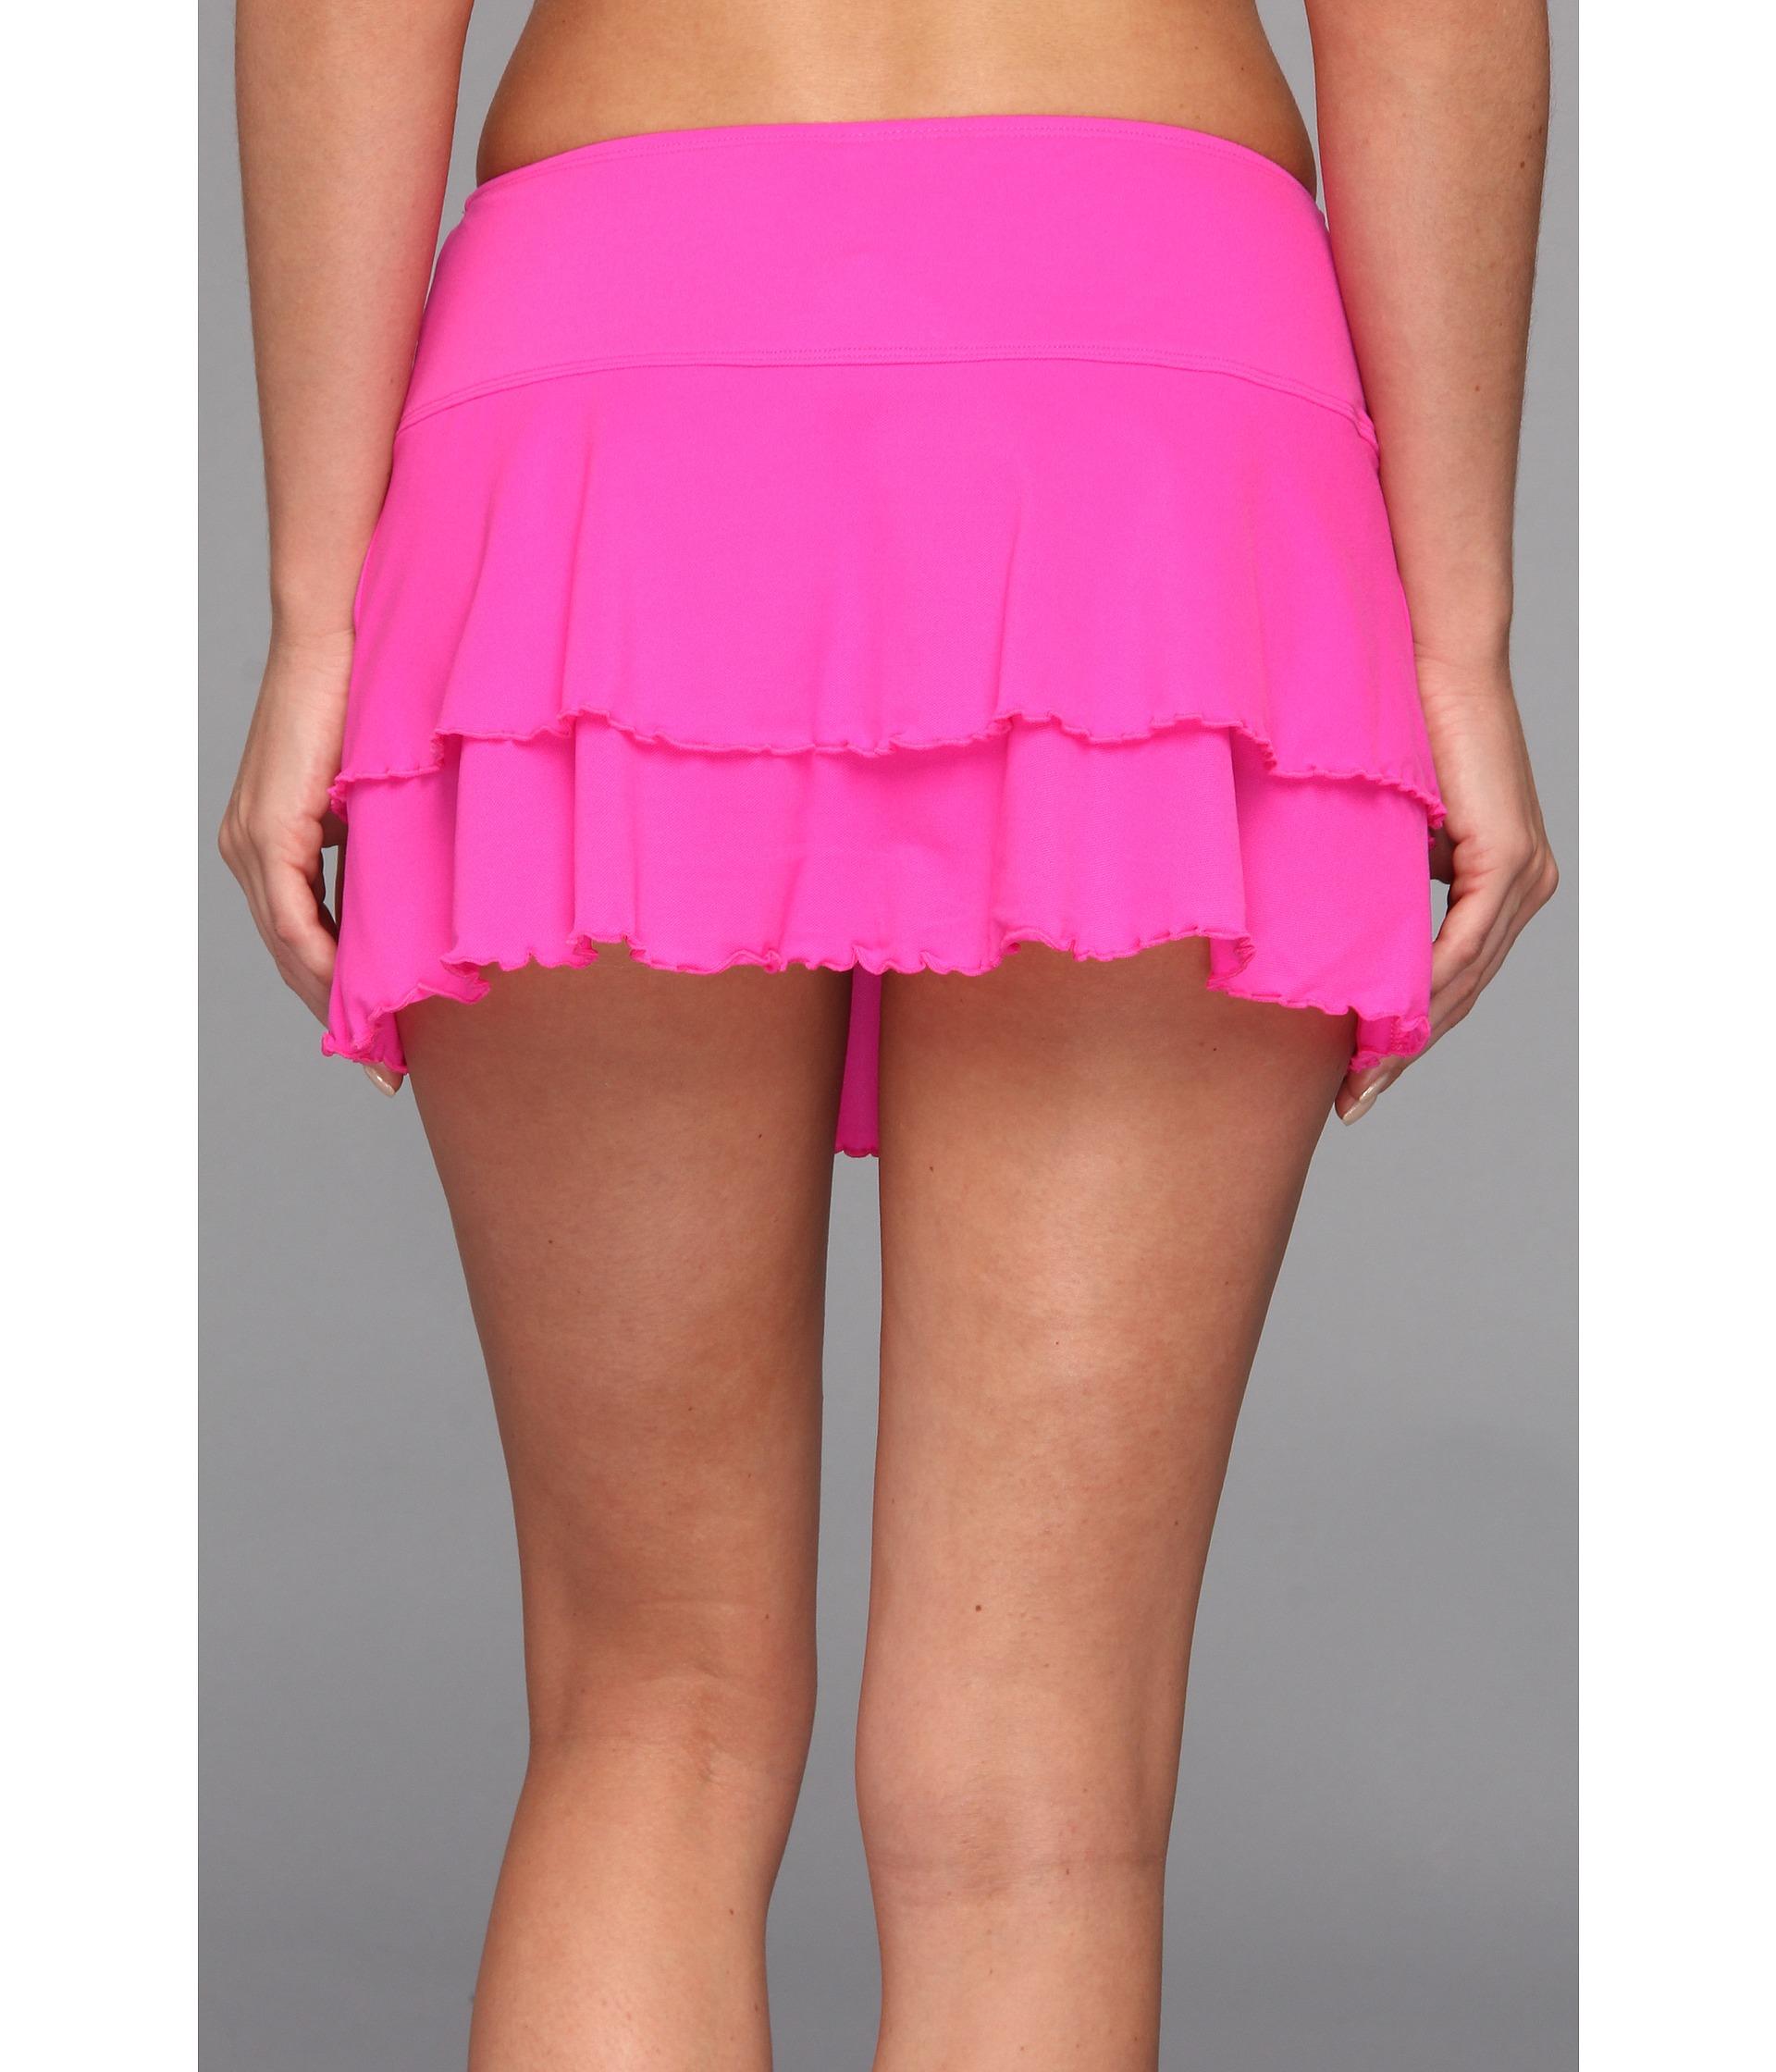 Body Glove Skirt 59